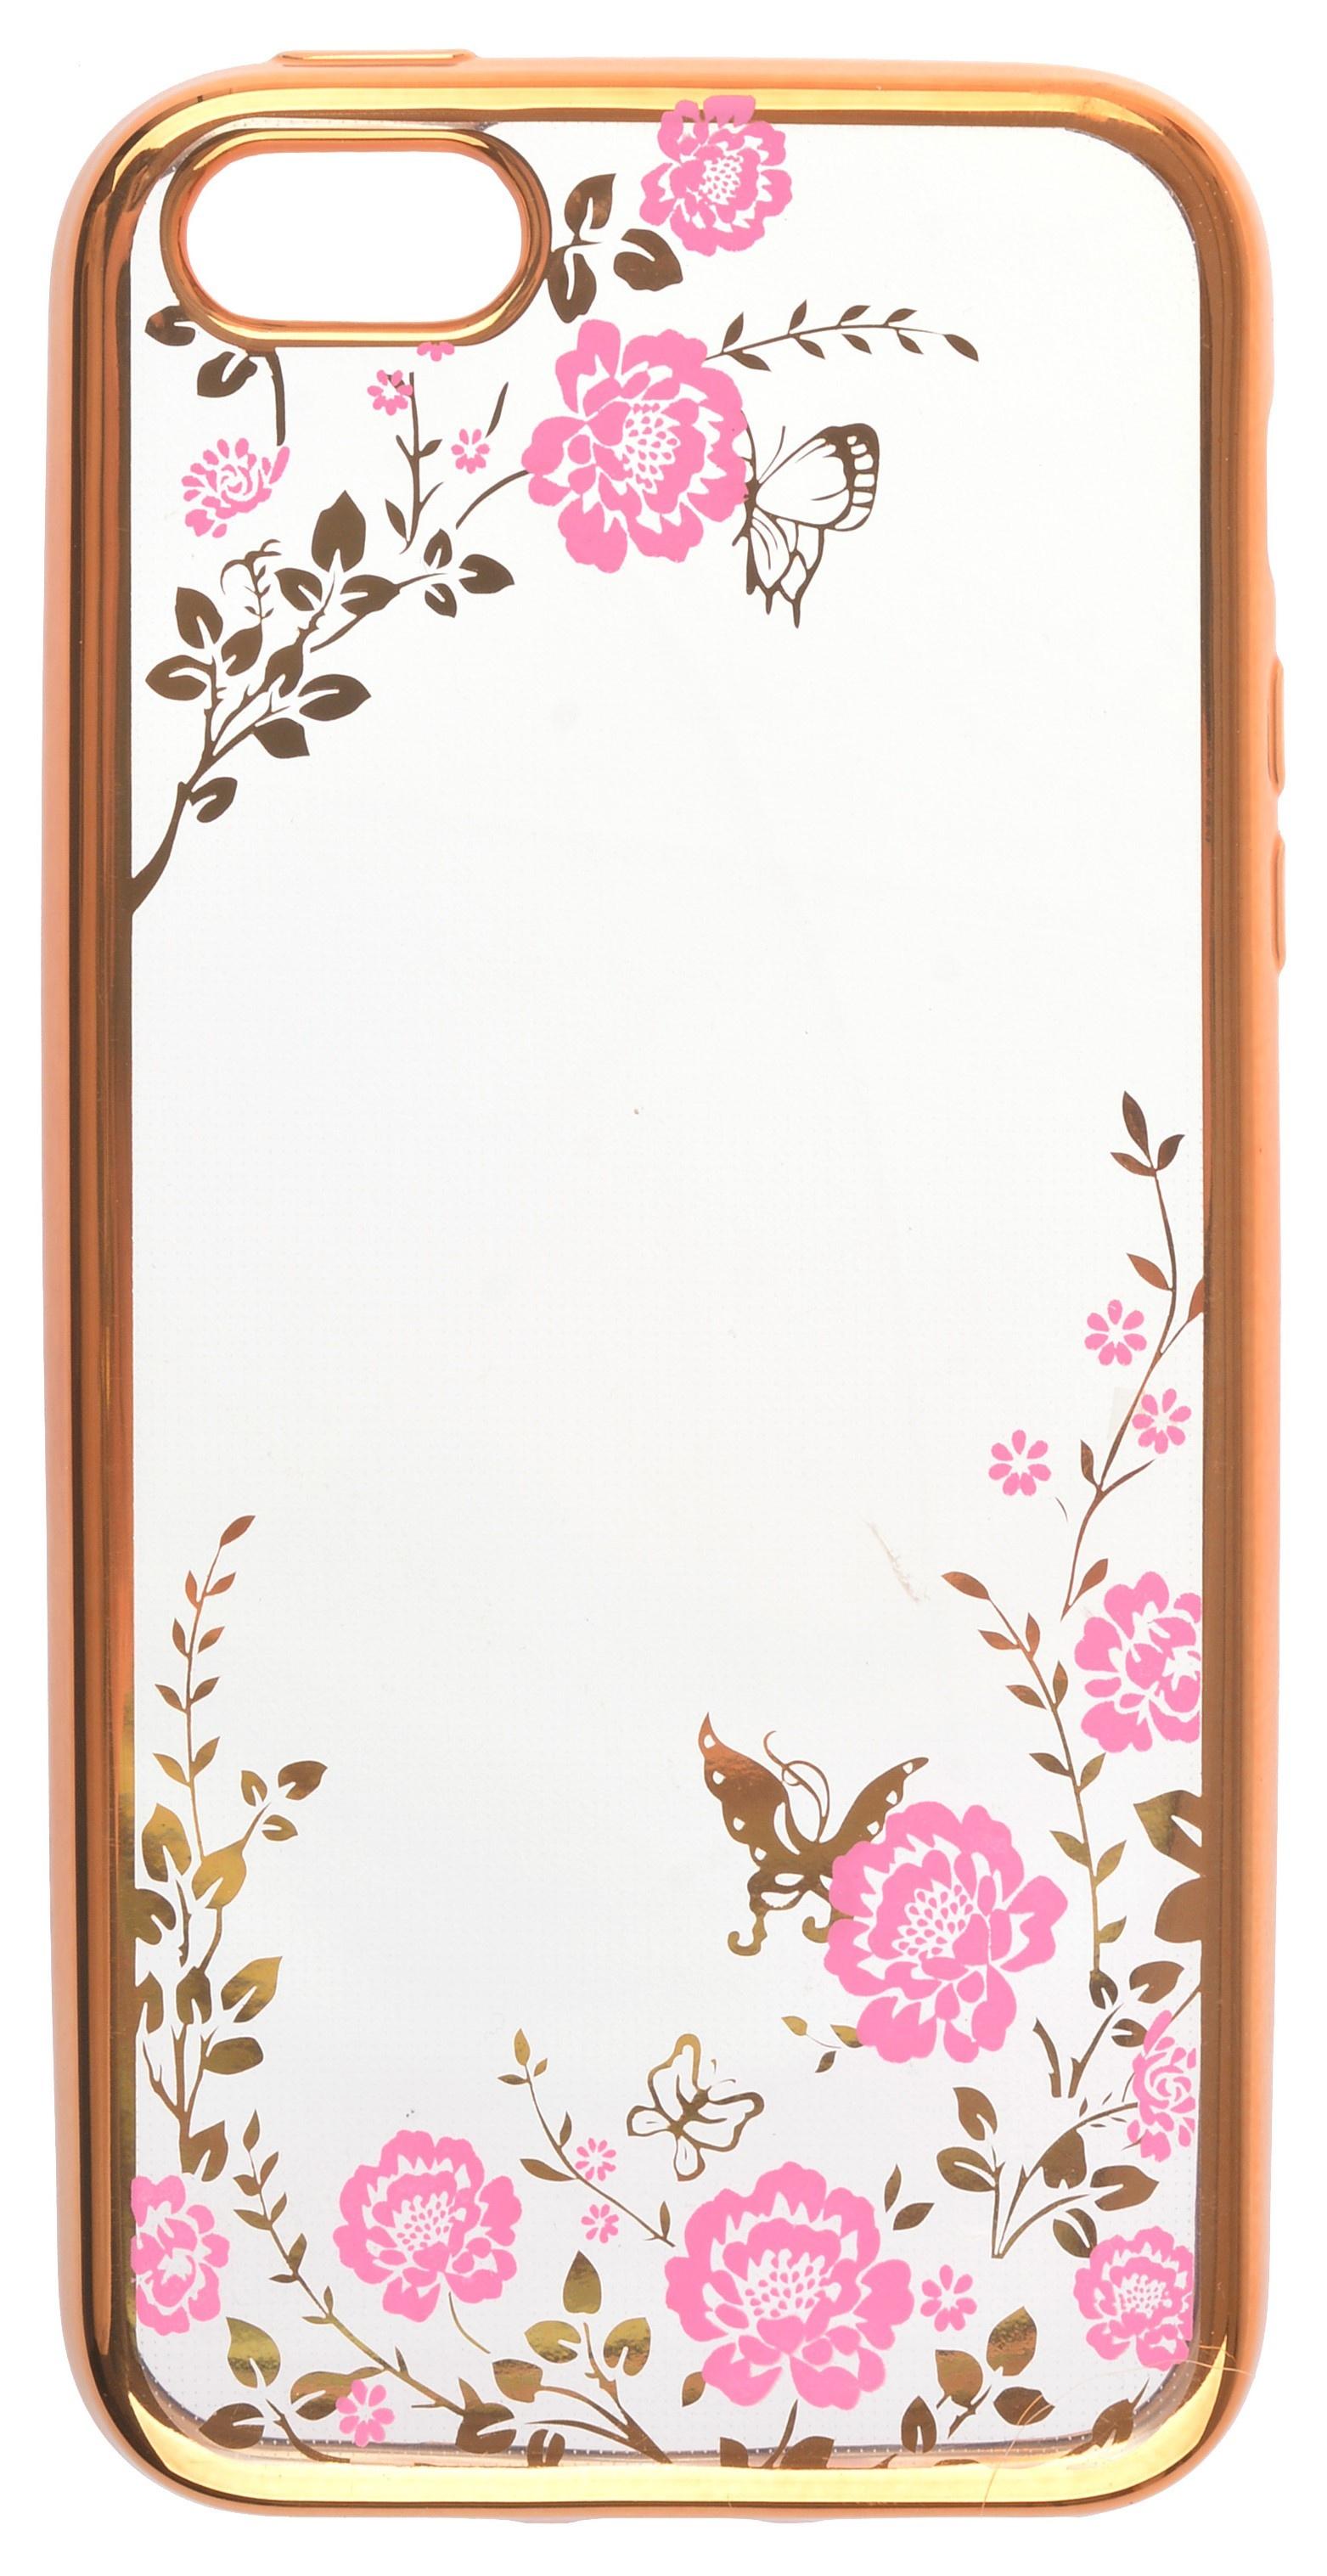 Накладка skinBOX для Apple Iphone 5/5S, 2000000111940, розовый booratino деревянная накладка для iphone 5 5s орех